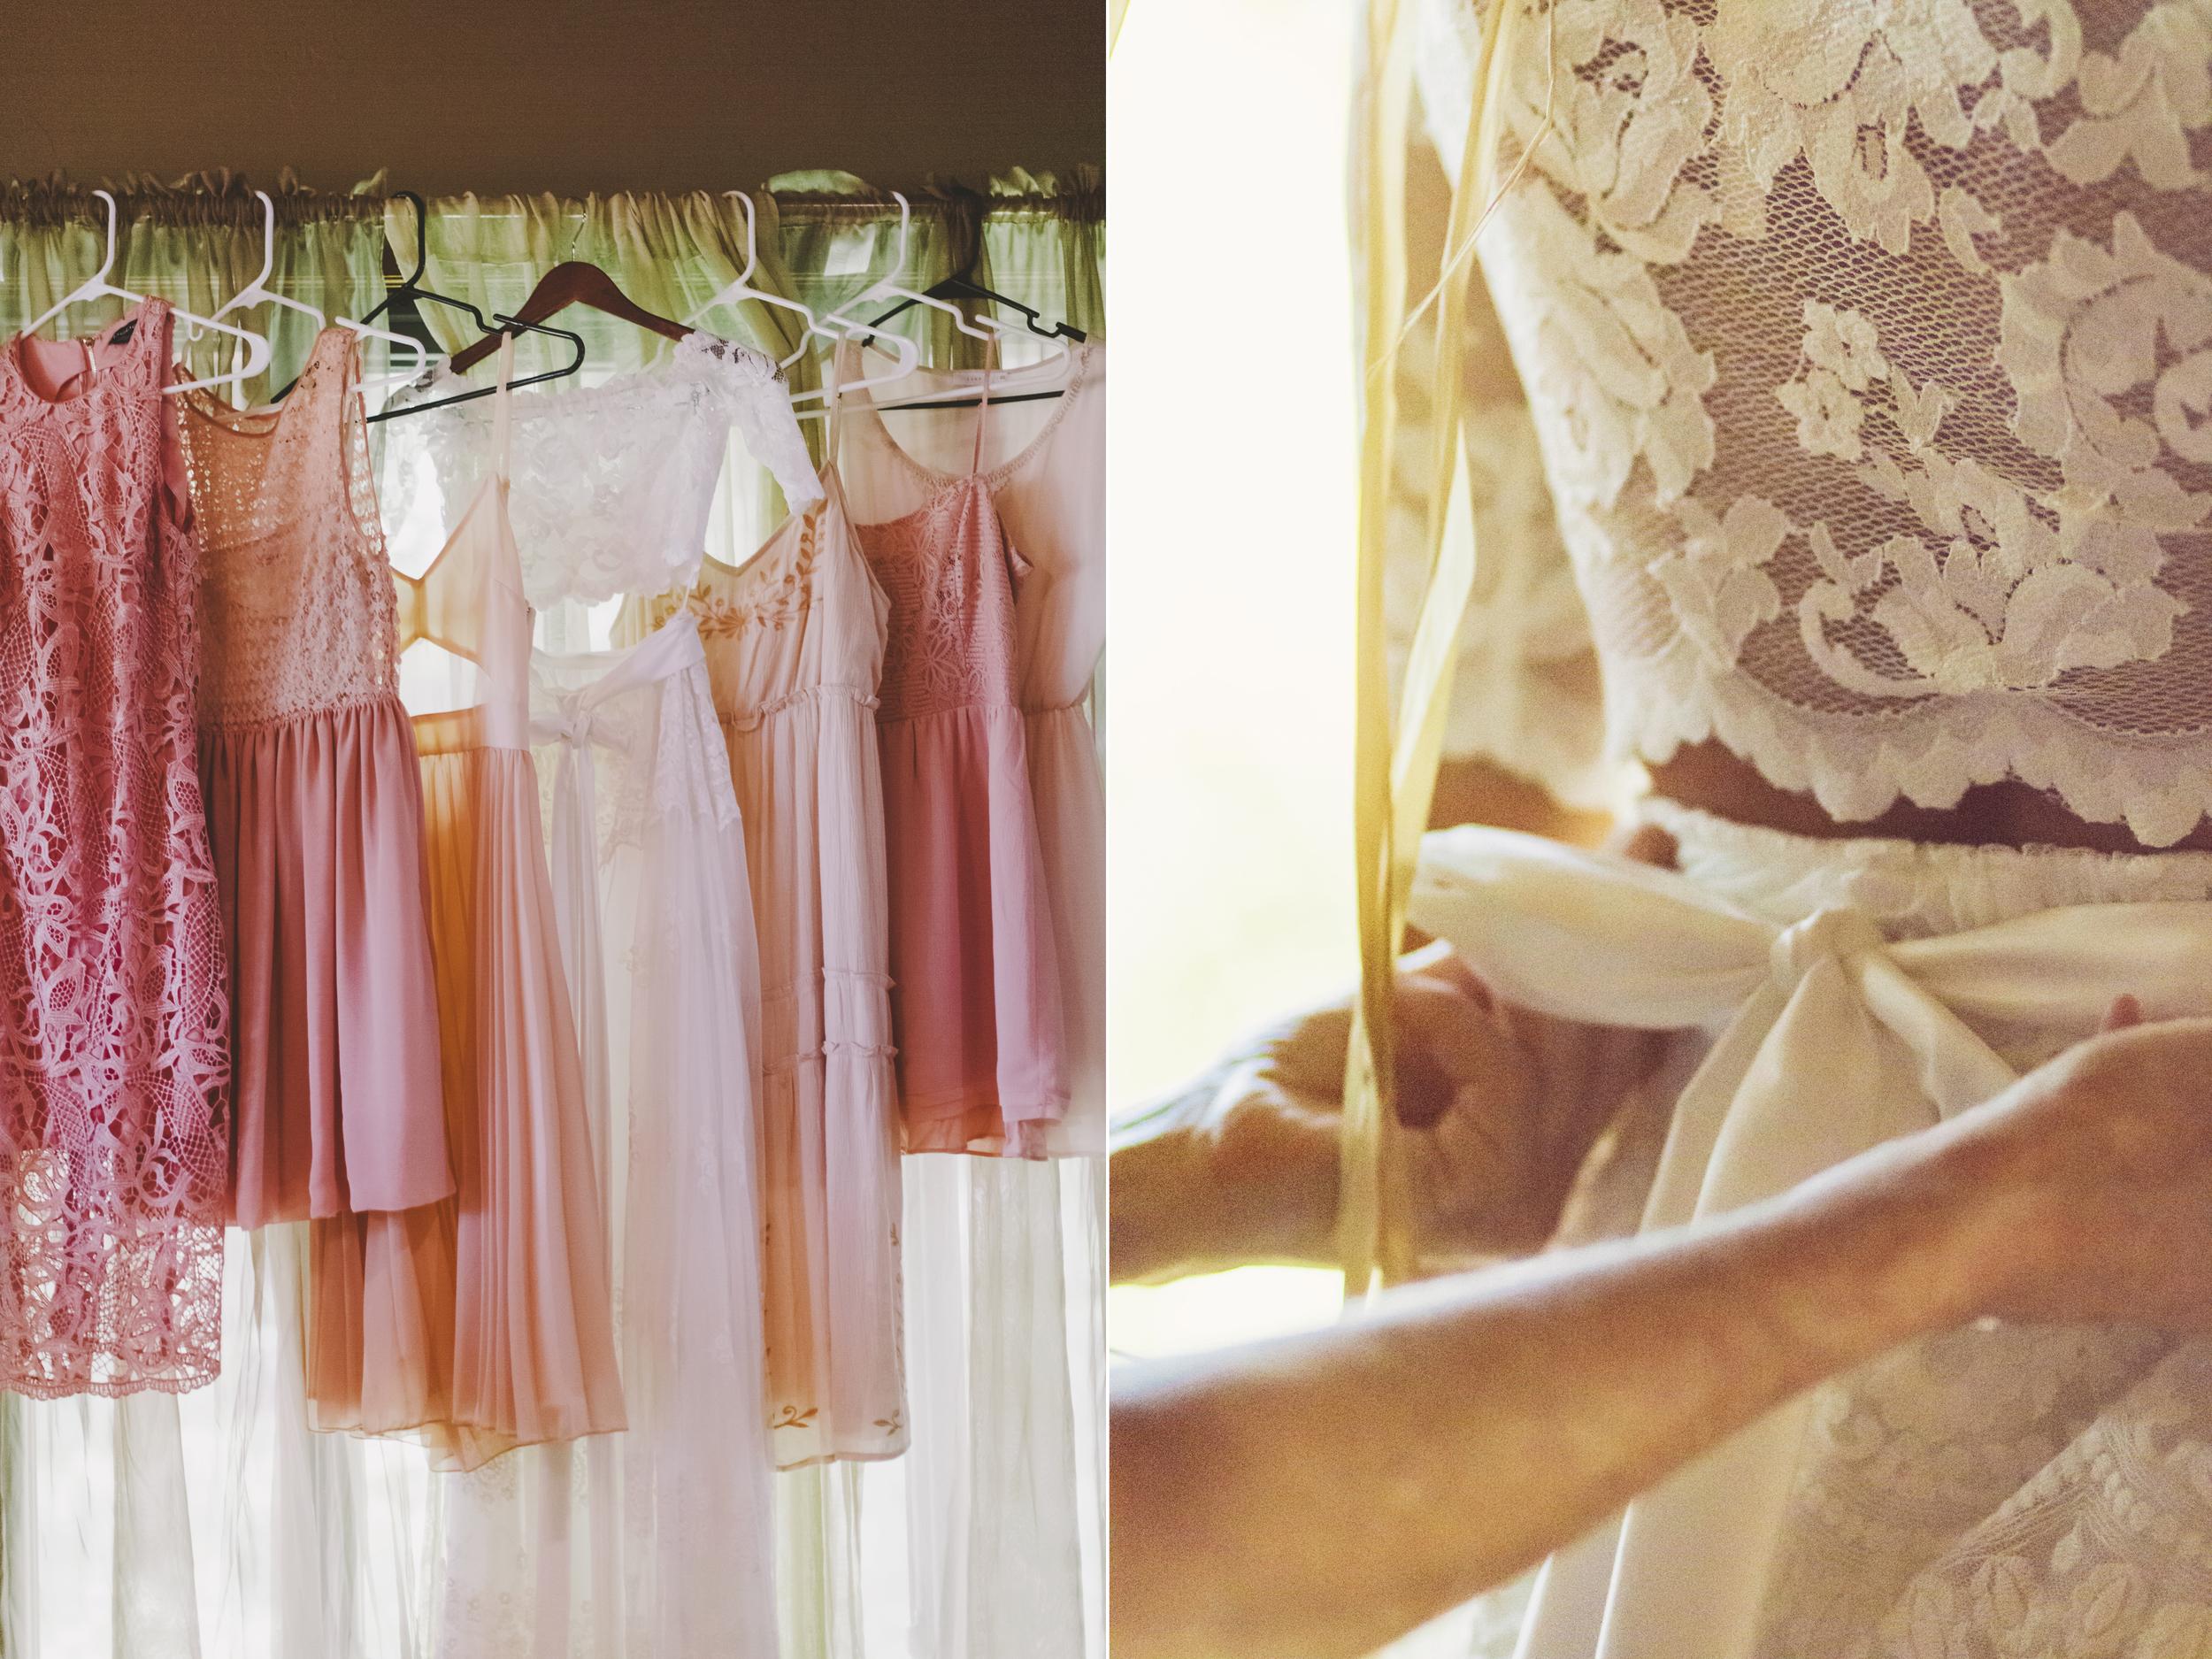 angie-diaz-photography-oahu-hawaii-wedding-tradewinds-ranch-15.jpg